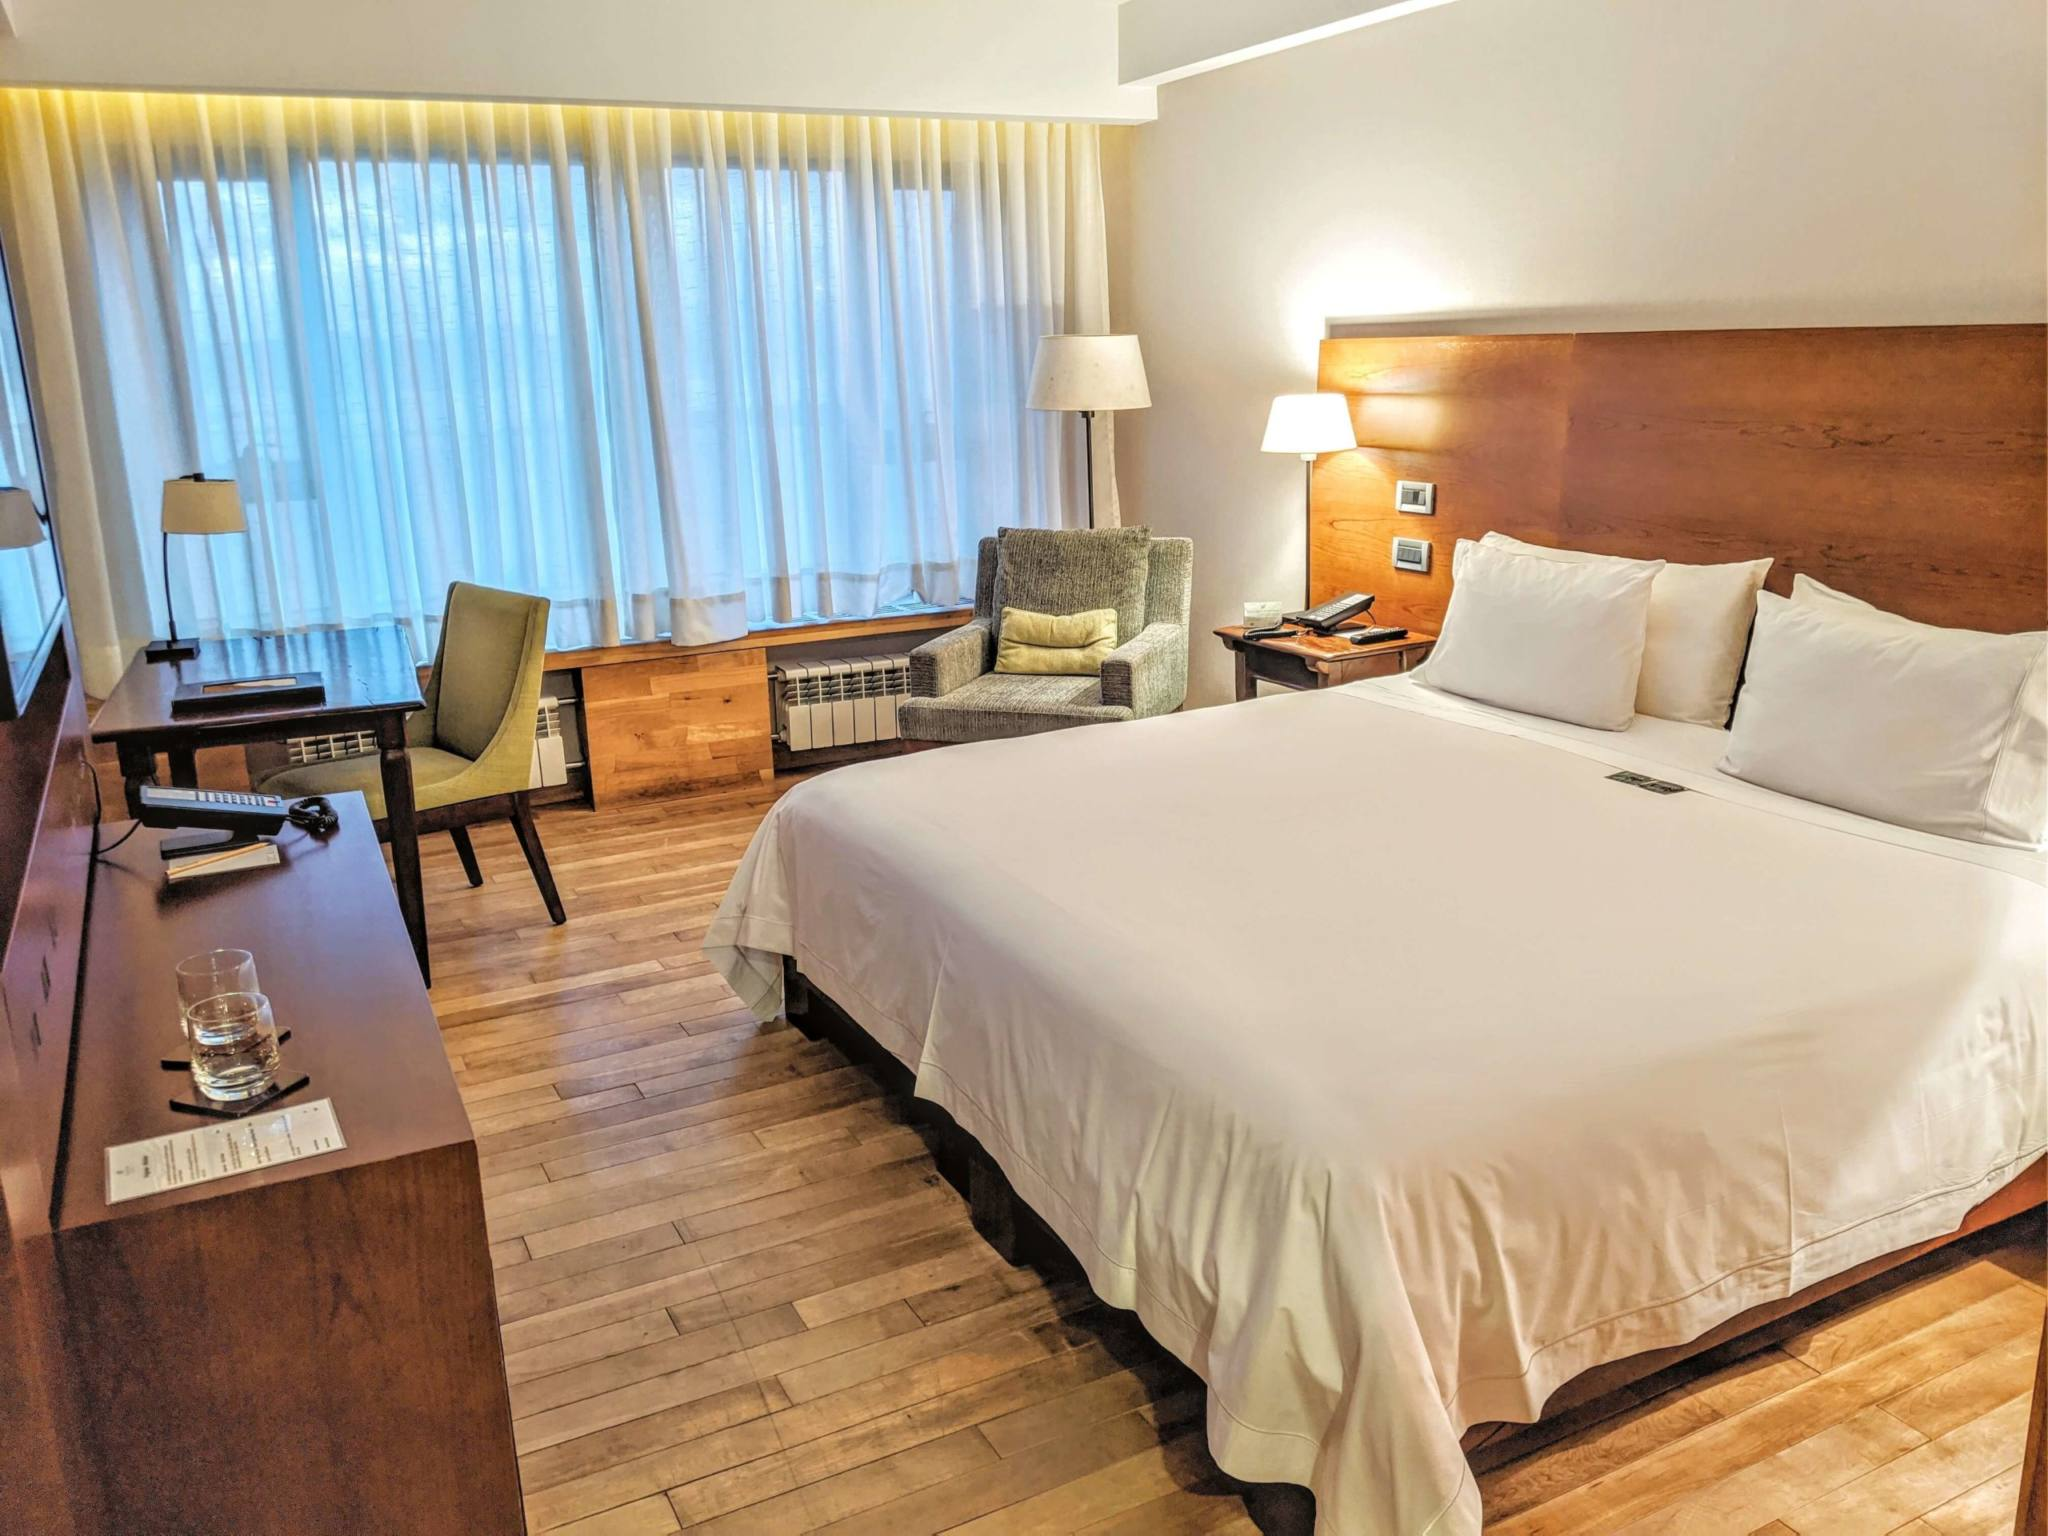 Arakur Hotel in Ushuaia